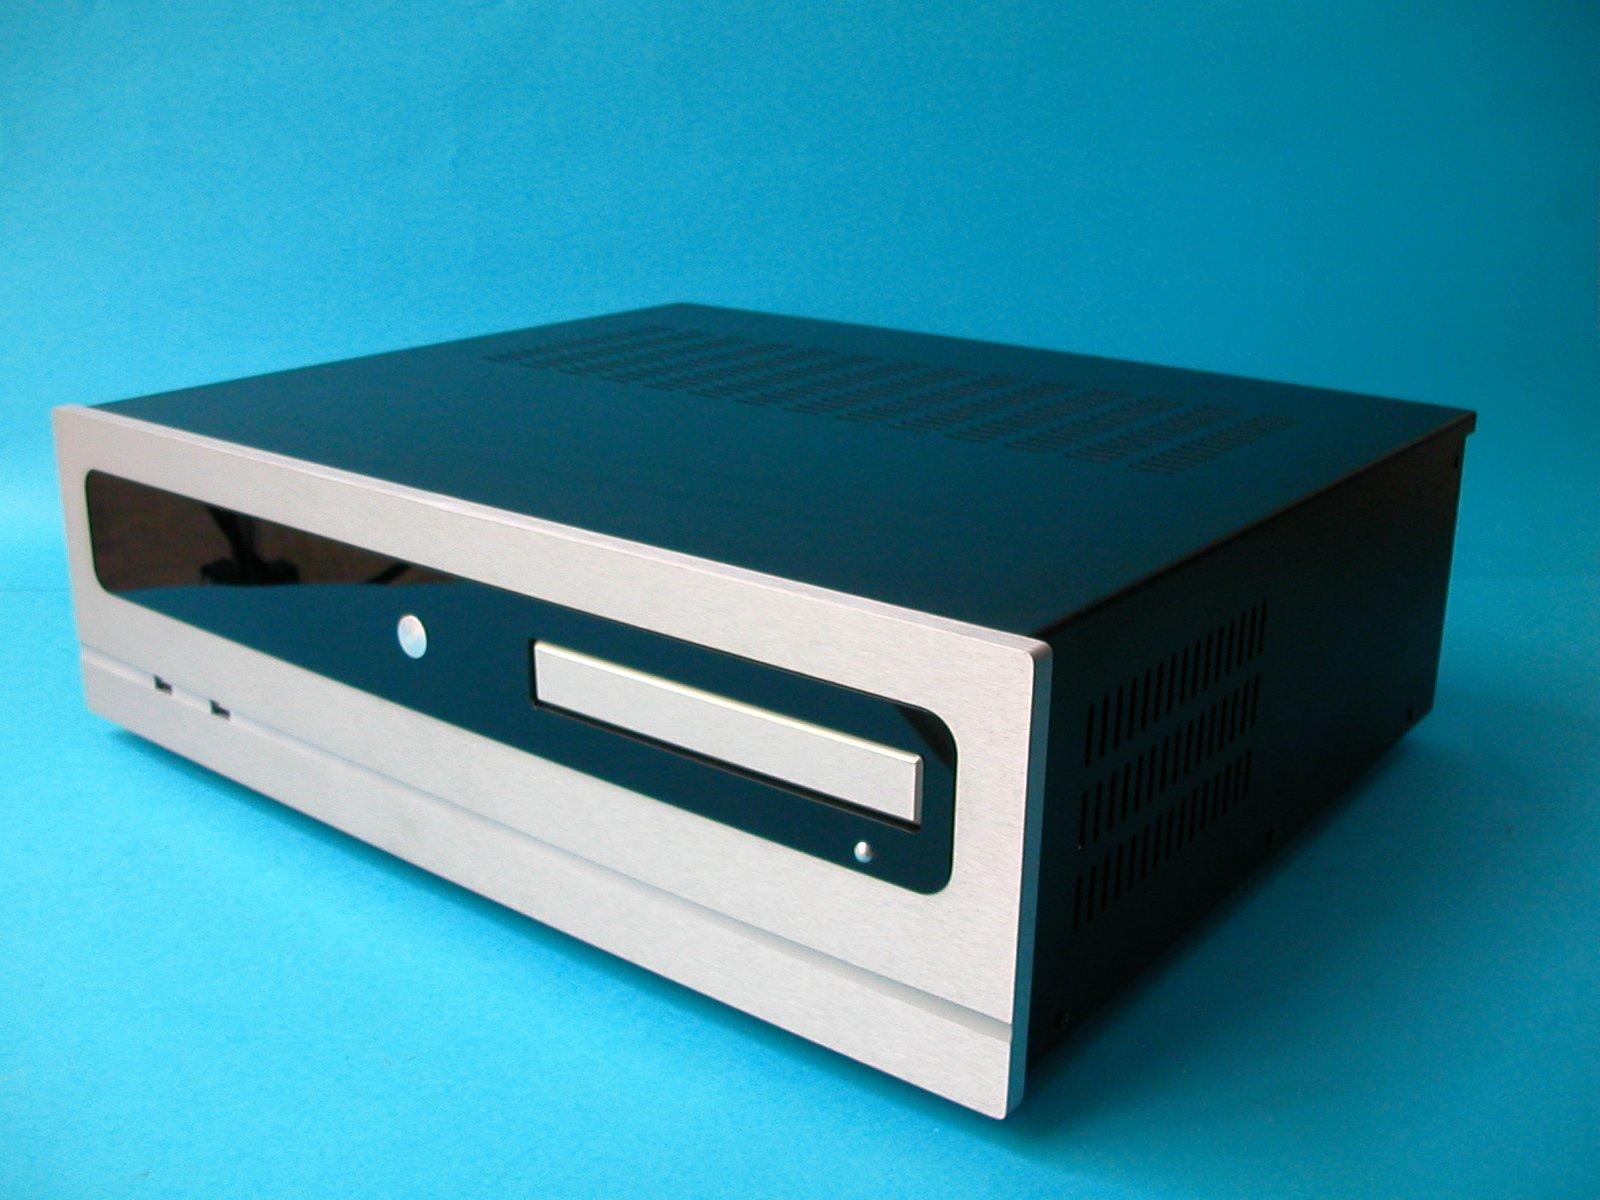 1CD21B - PC, HTPC case